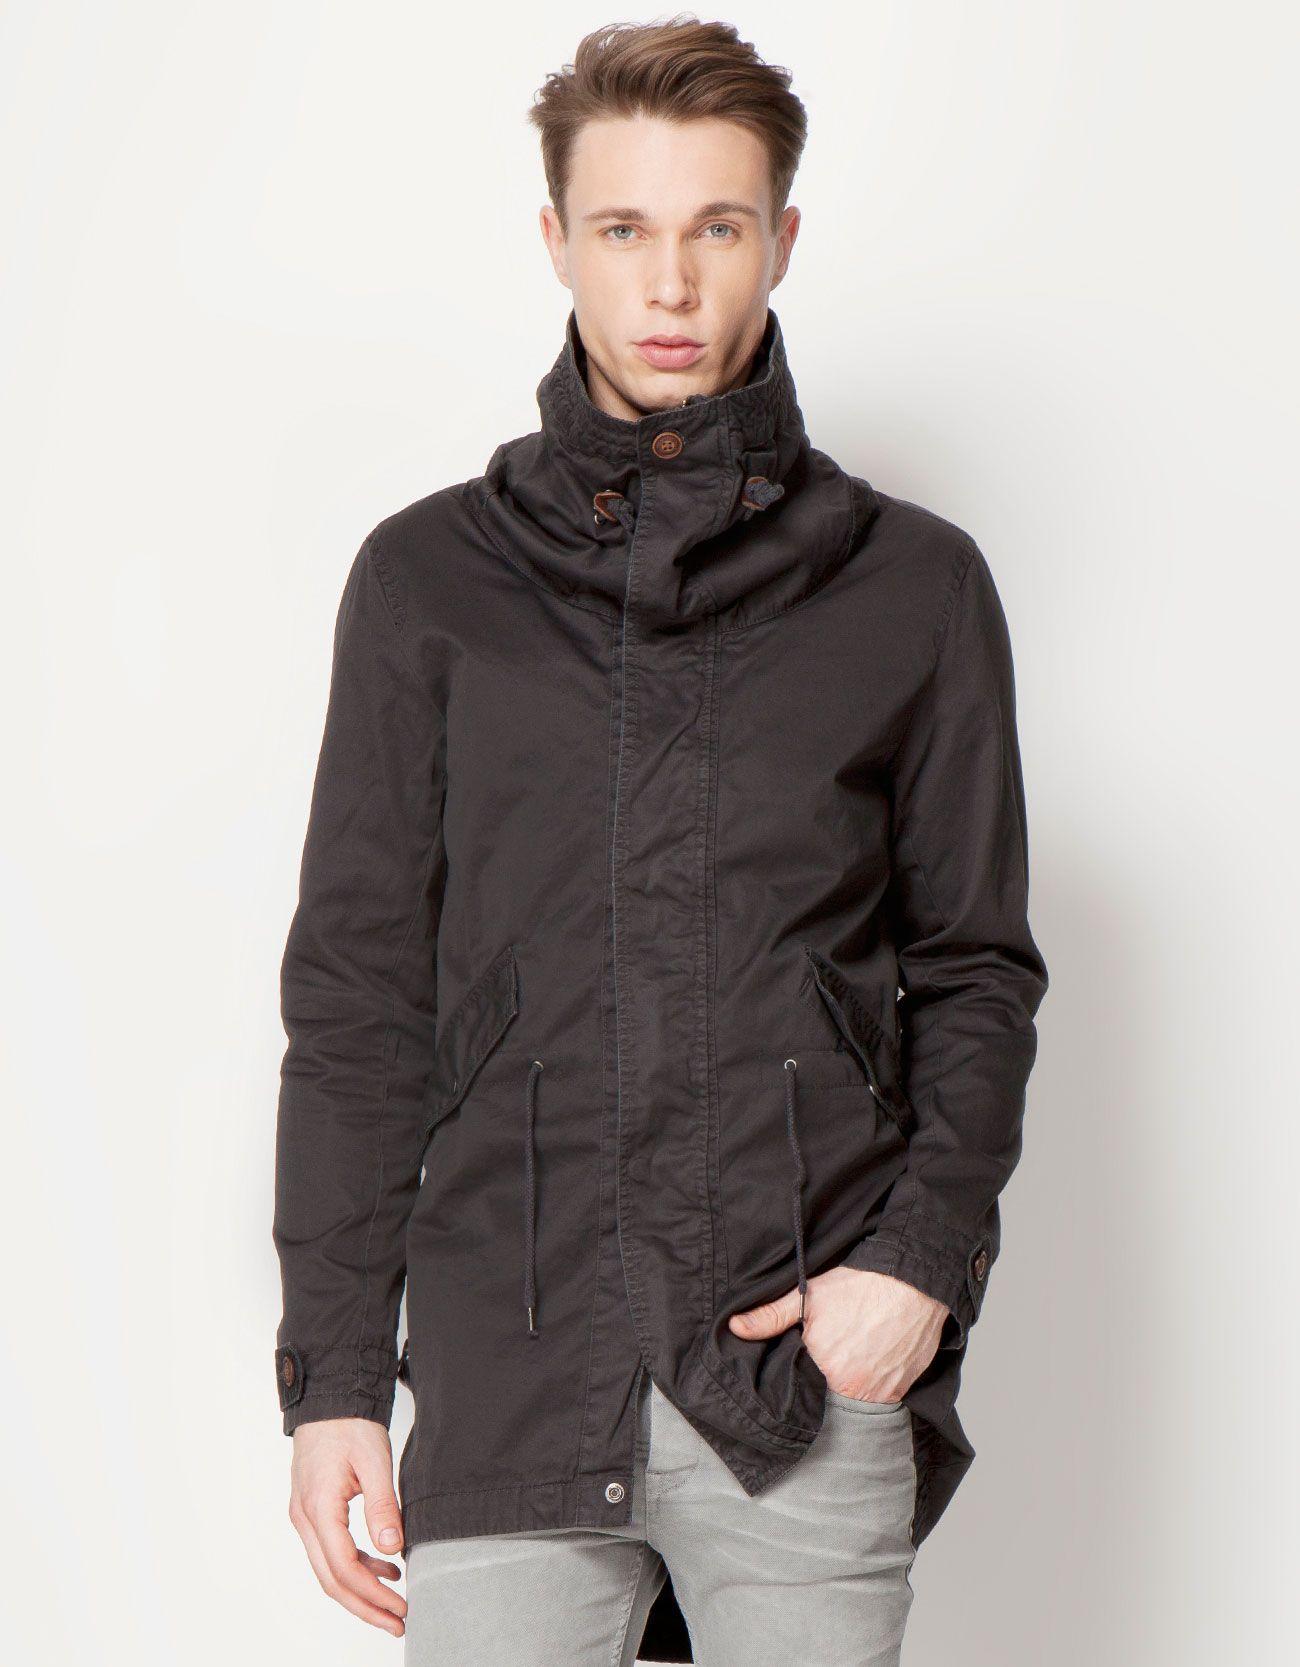 Bershka Deutschland - Mantel lang schlapper Kragen